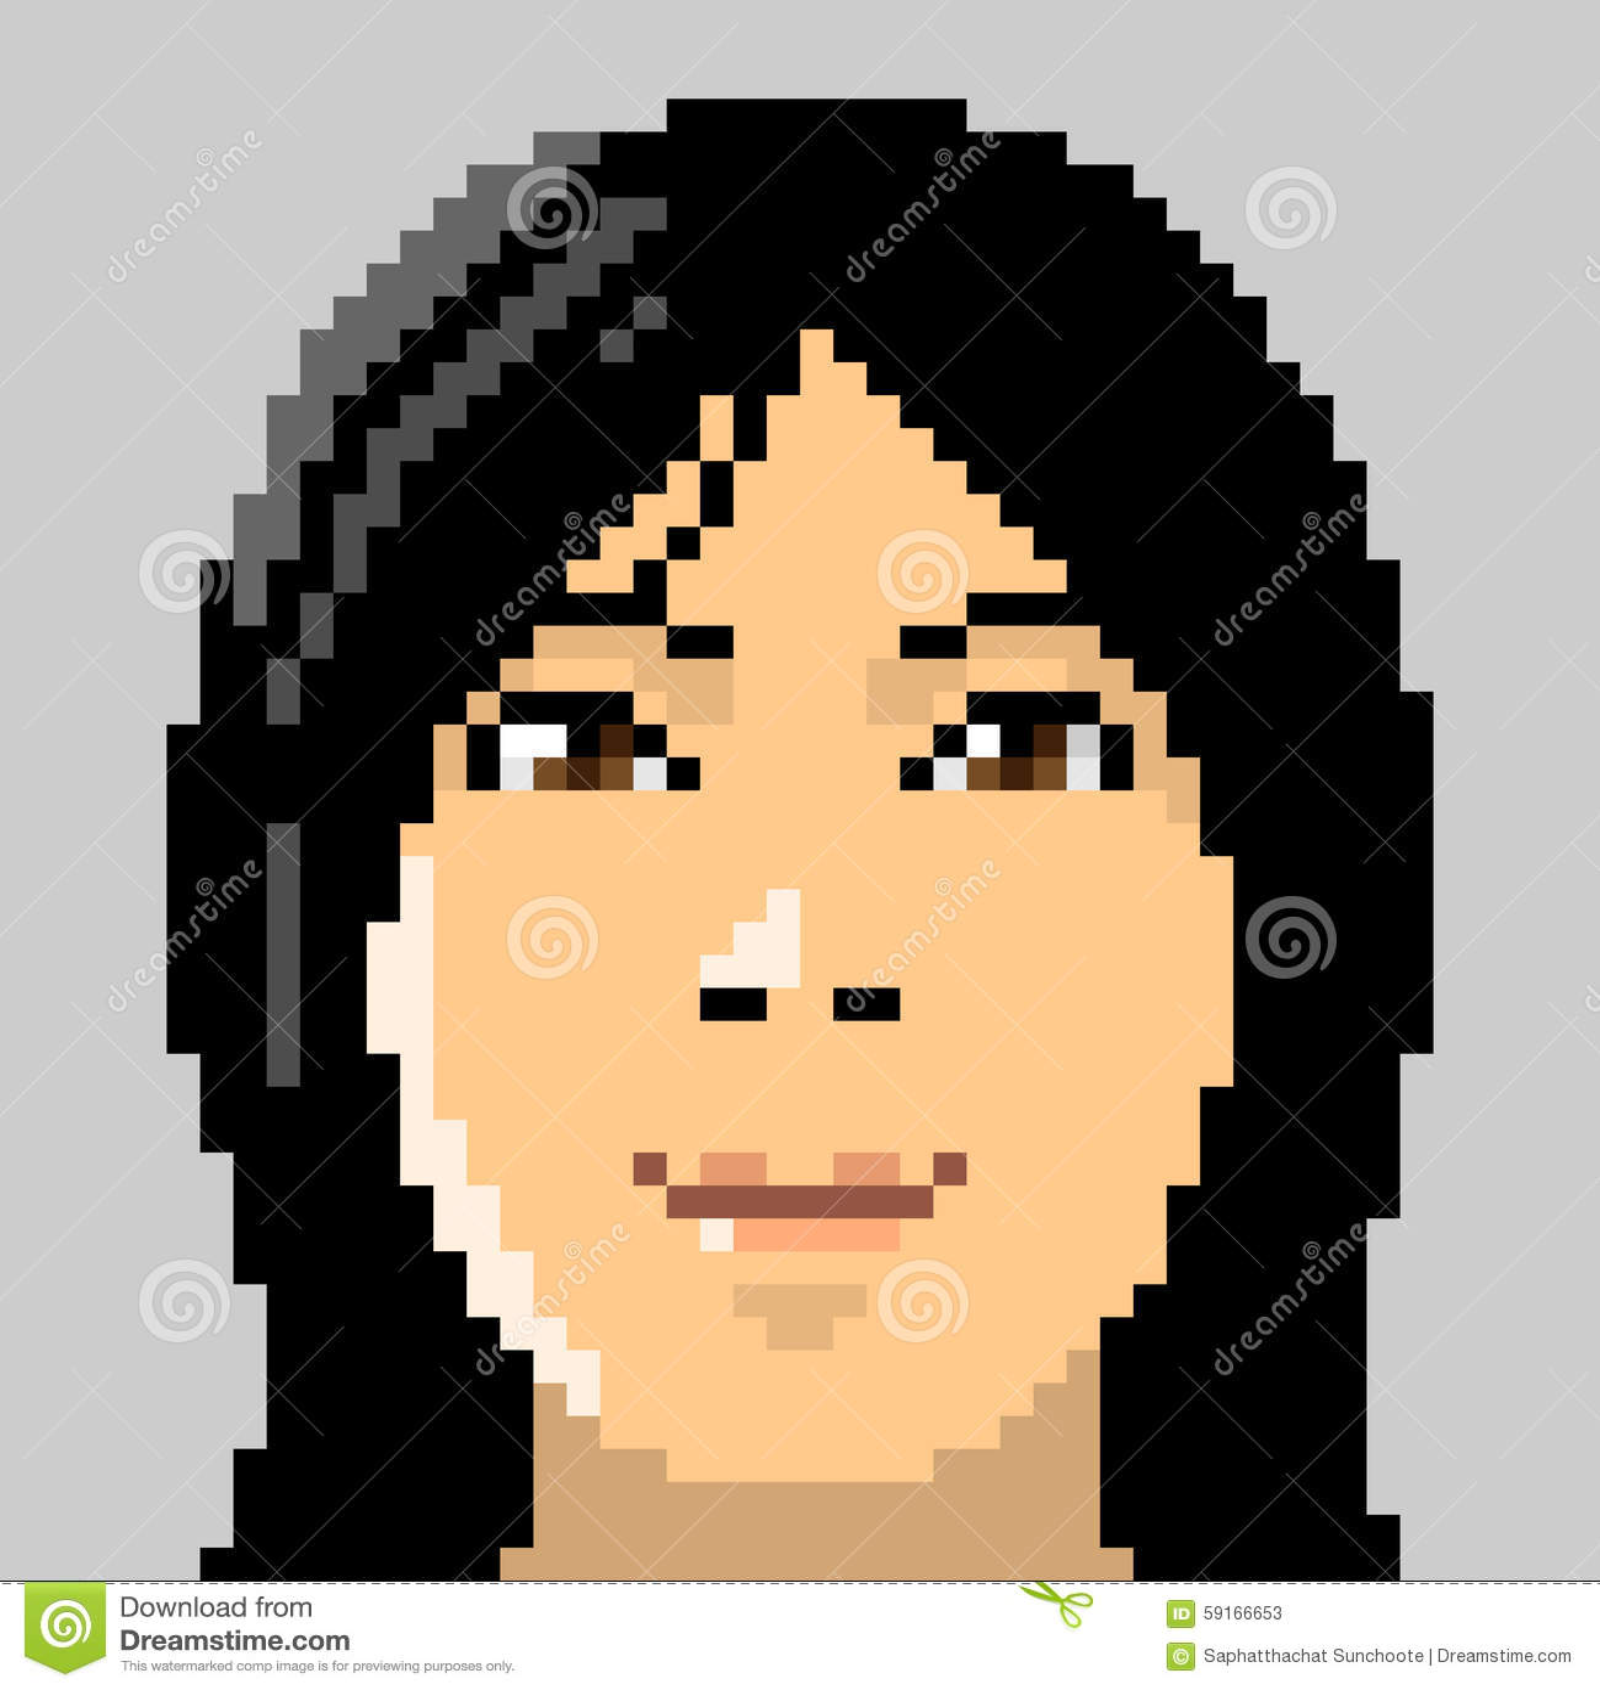 Illustration Pixel Art Human Face Stock Vector